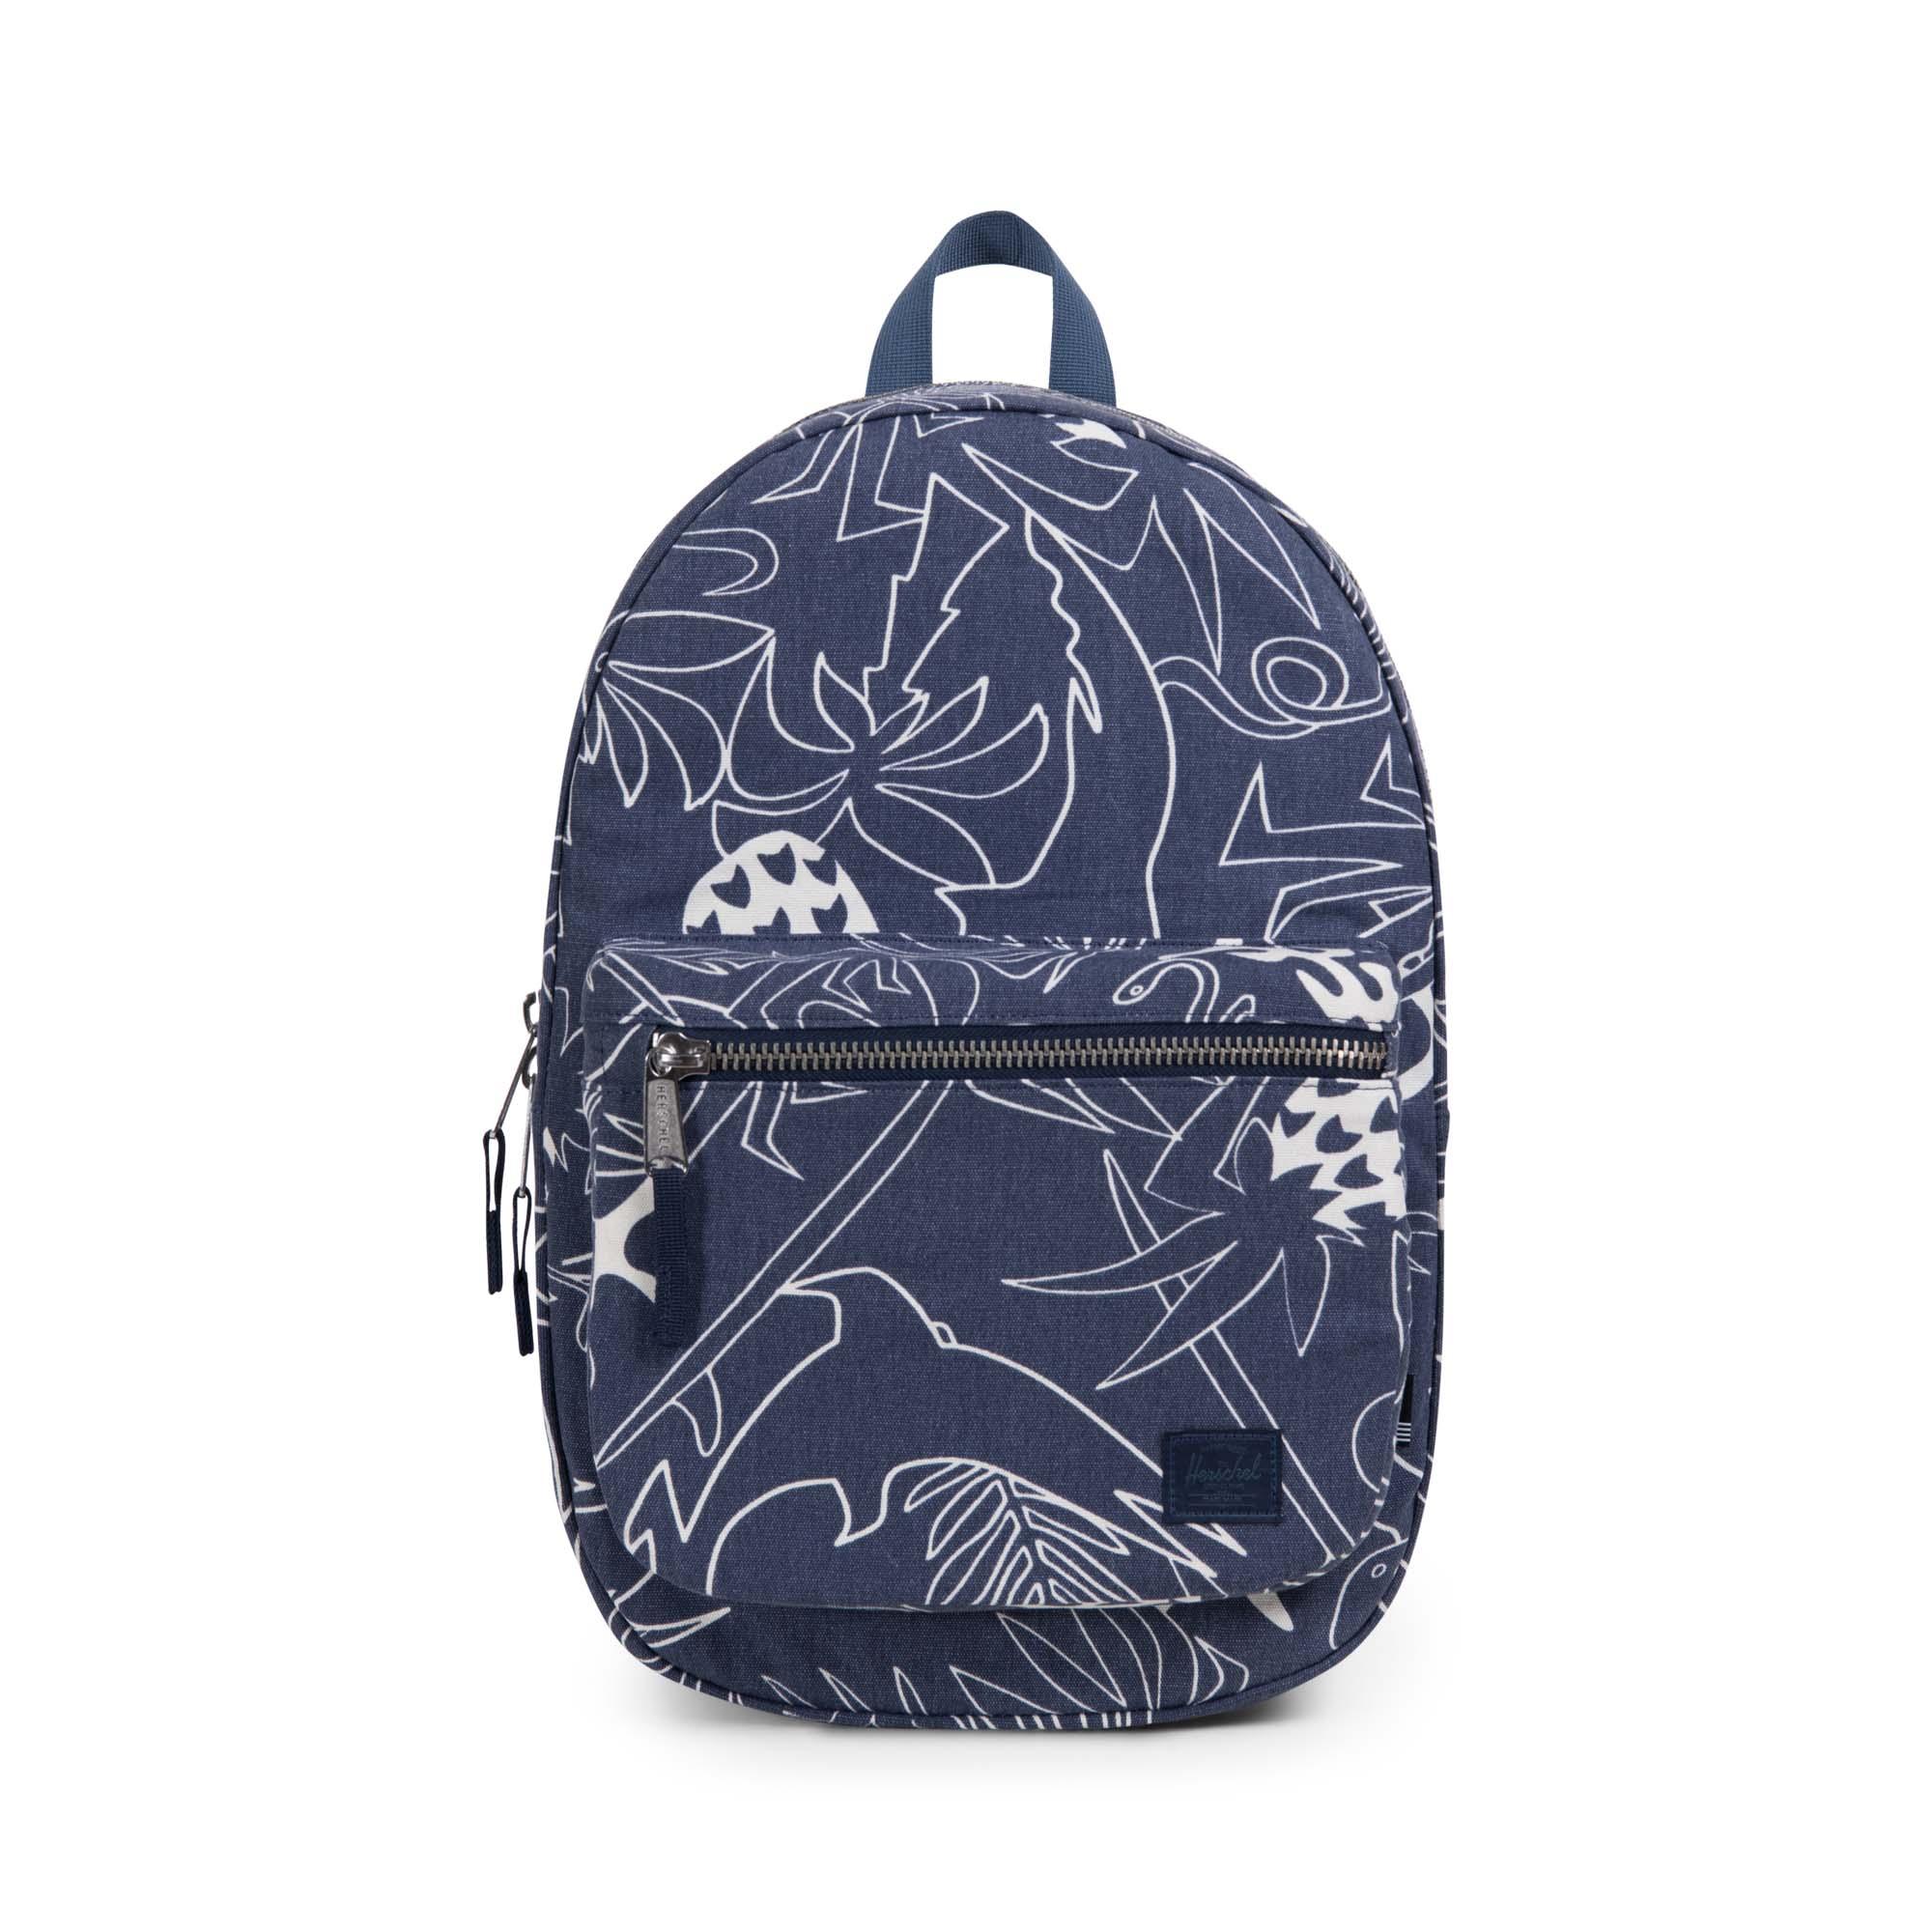 ee32d53f326 Lawson Backpack